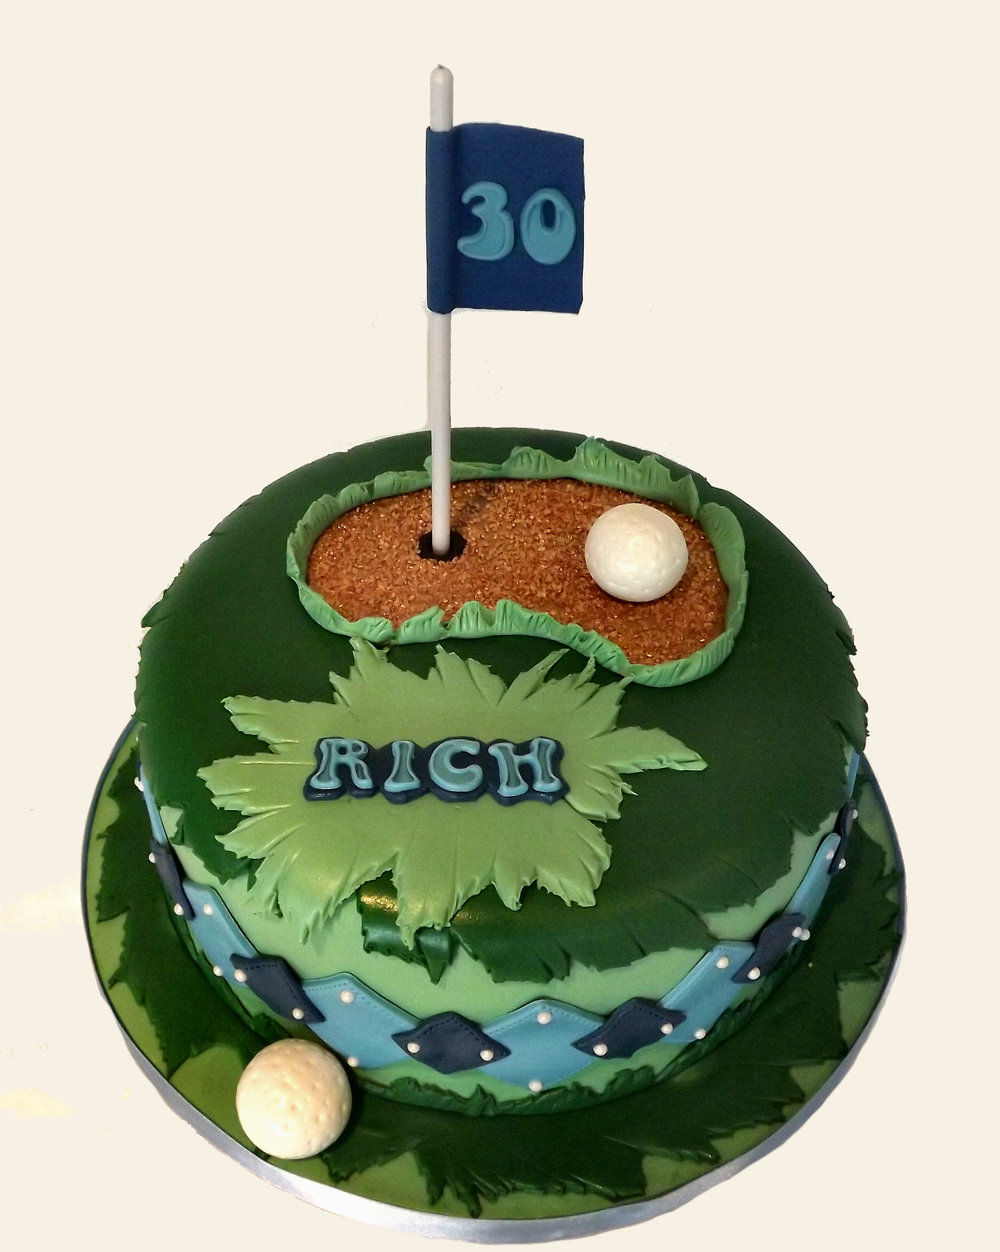 golf cake 2.jpg